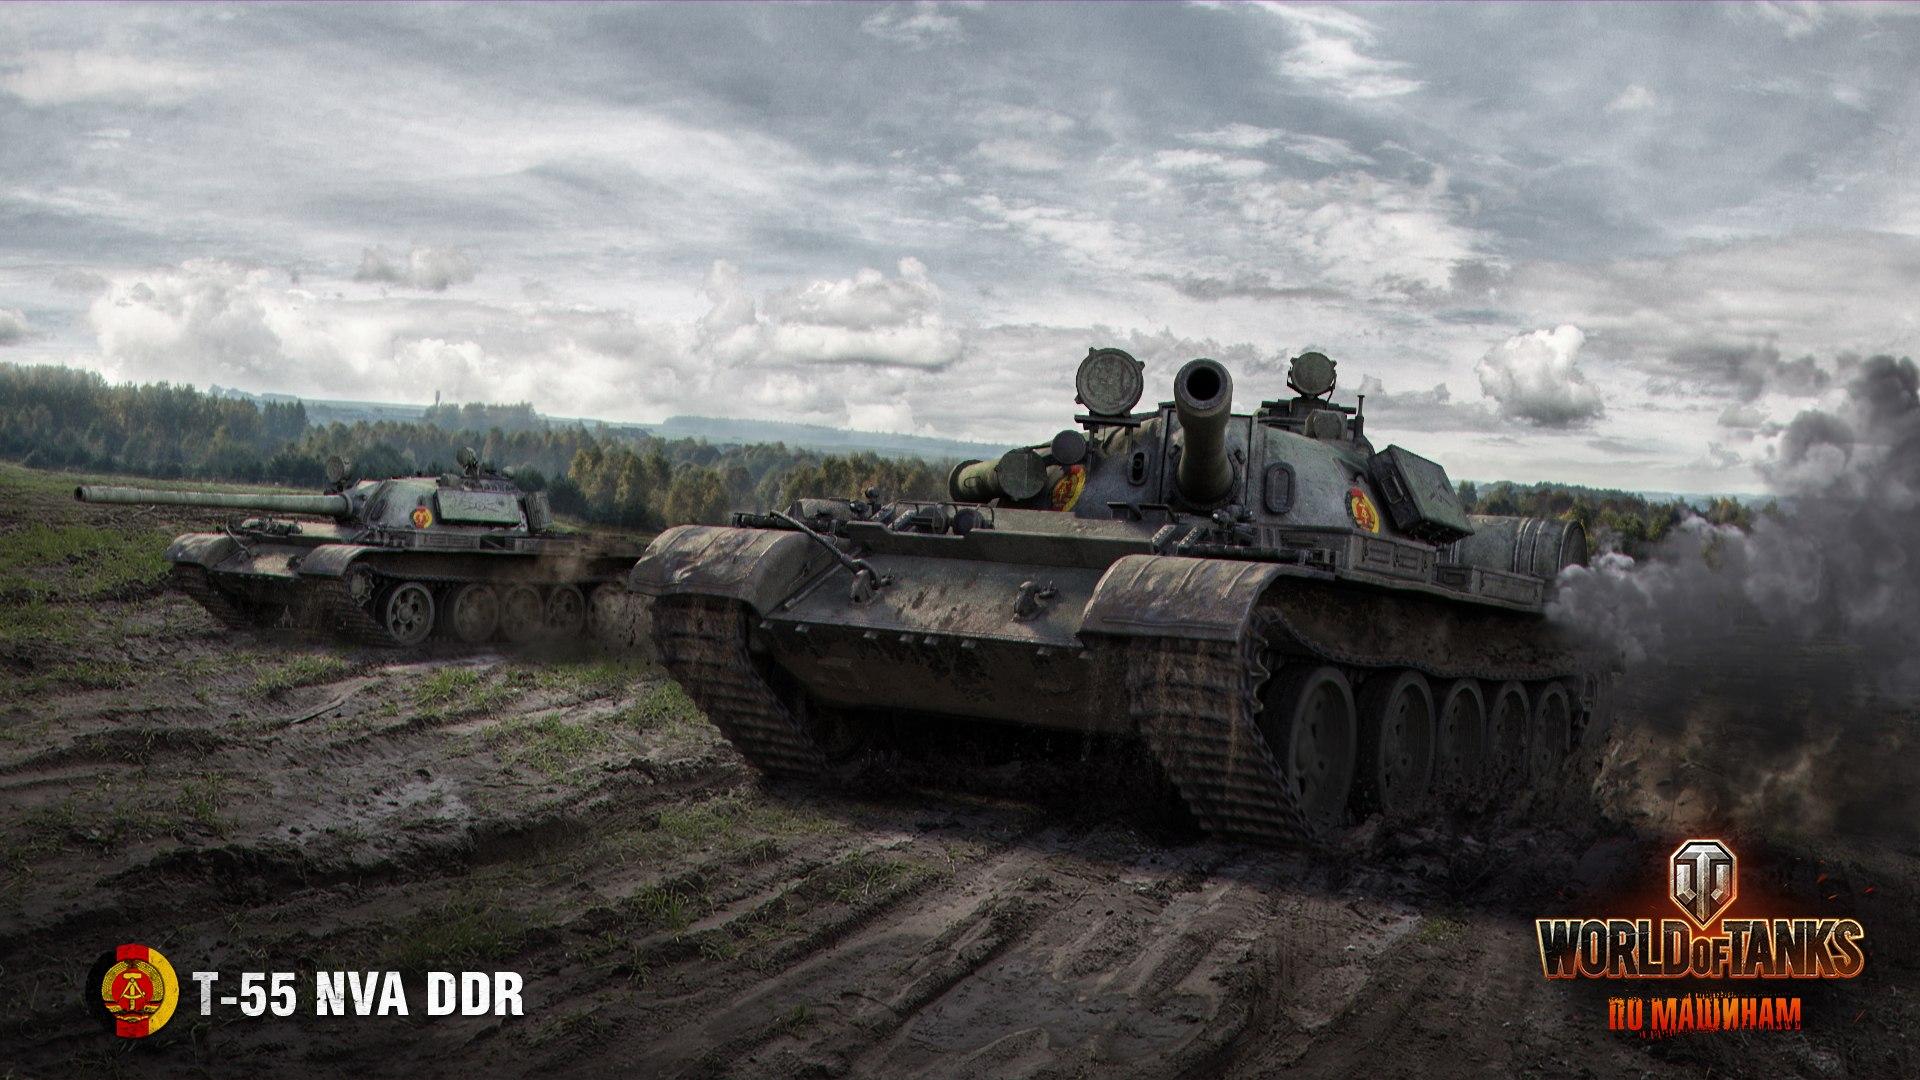 рисунок T-55 NVA DDR